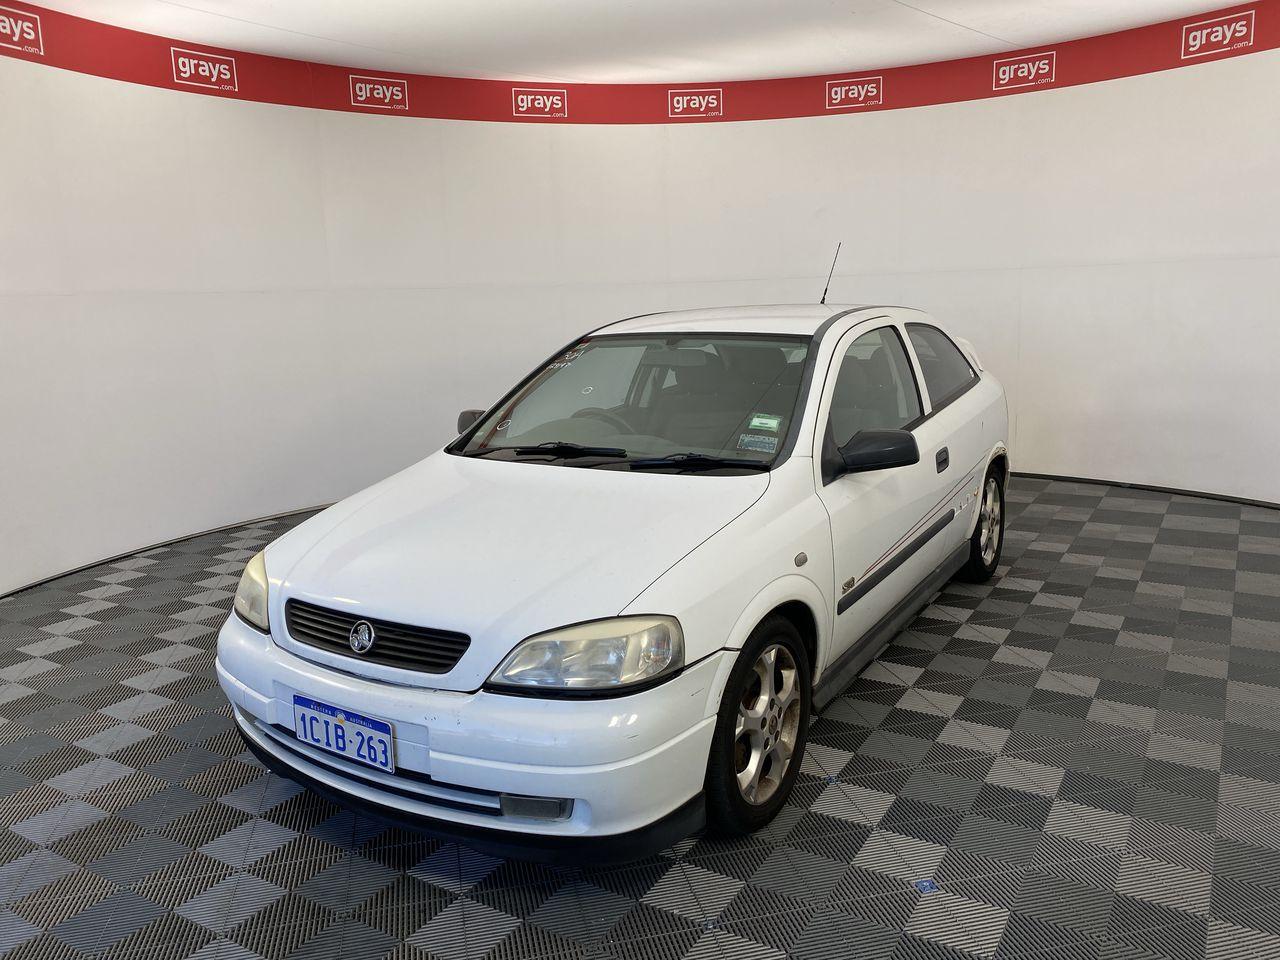 2003 Holden Astra SRI TS Automatic Hatchback